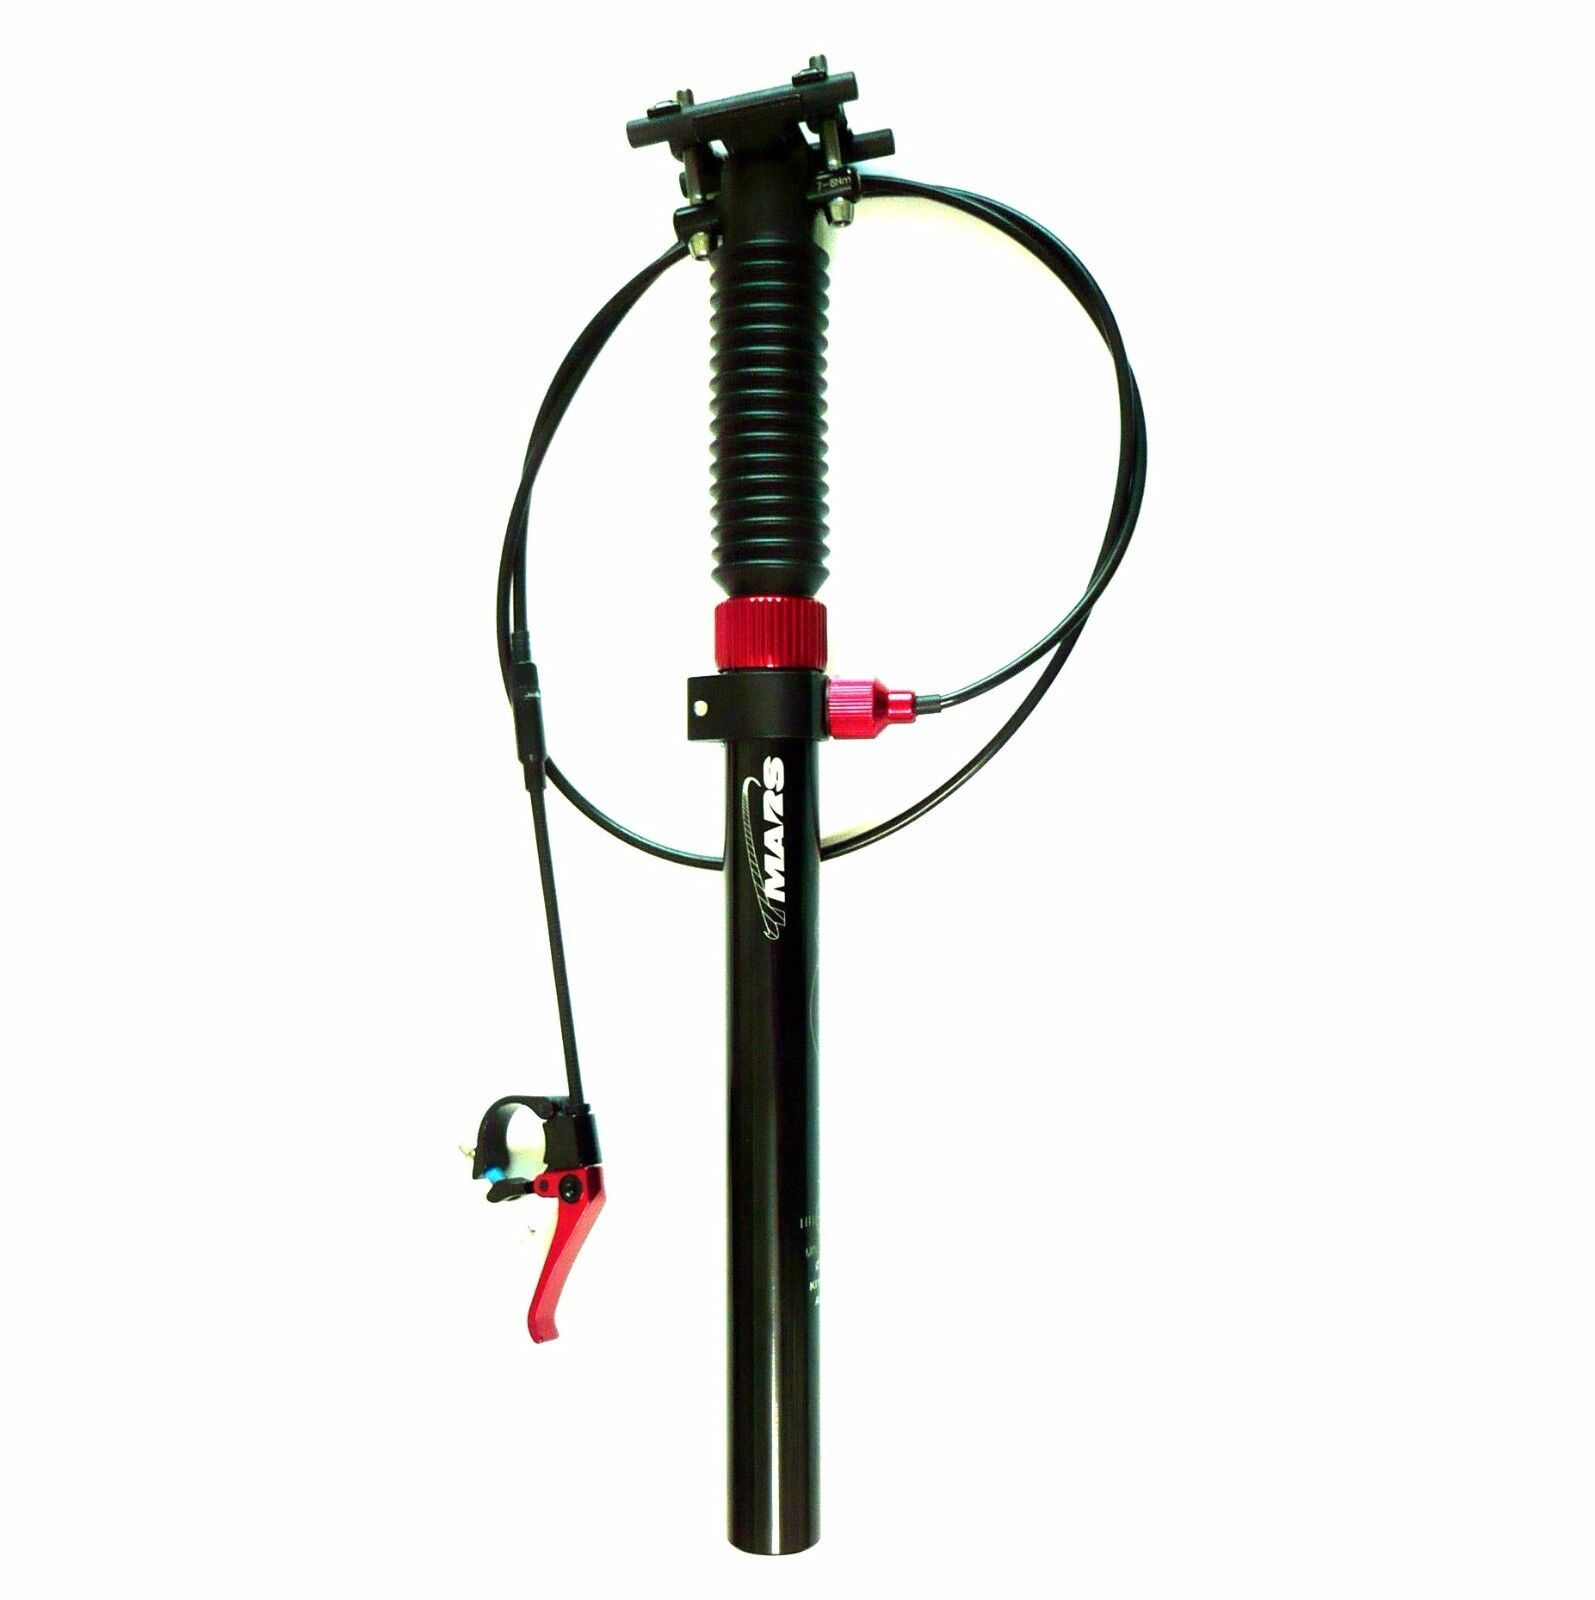 Black TMARS 419S Mechanical Drop Seatpost 445mm w// Remote 27.2// 30.9//31.6mm